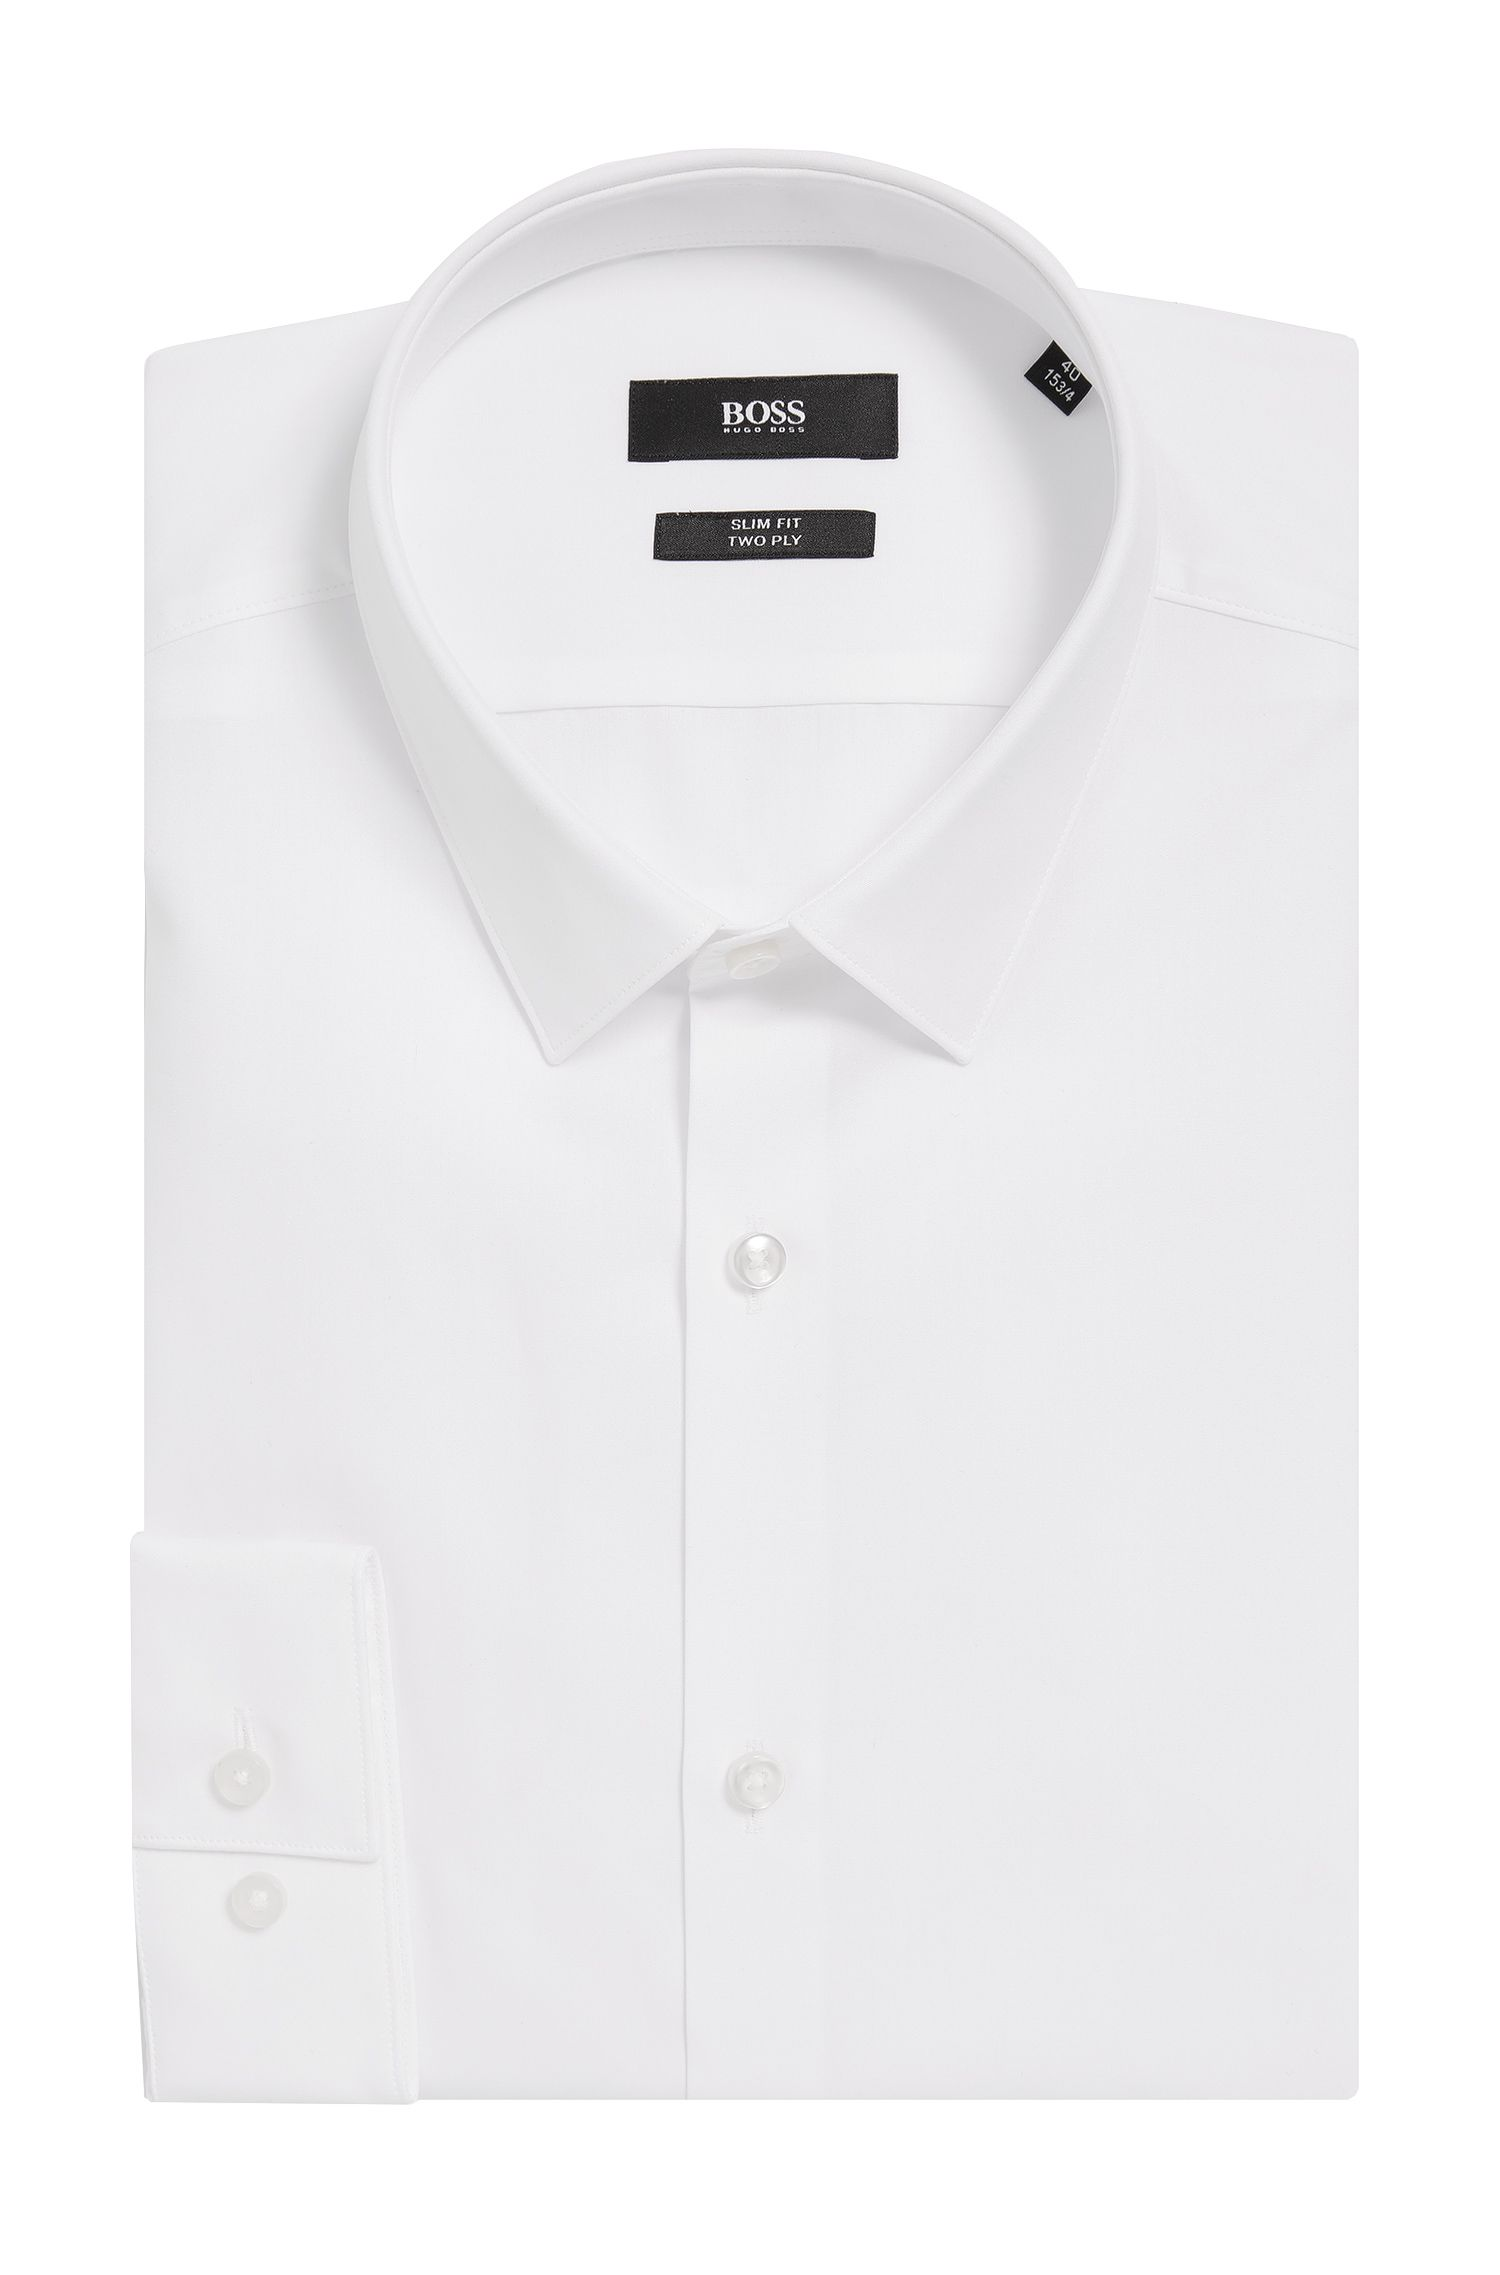 'llan' | Slim Fit, 2-Ply Italian Cotton Dress Shirt